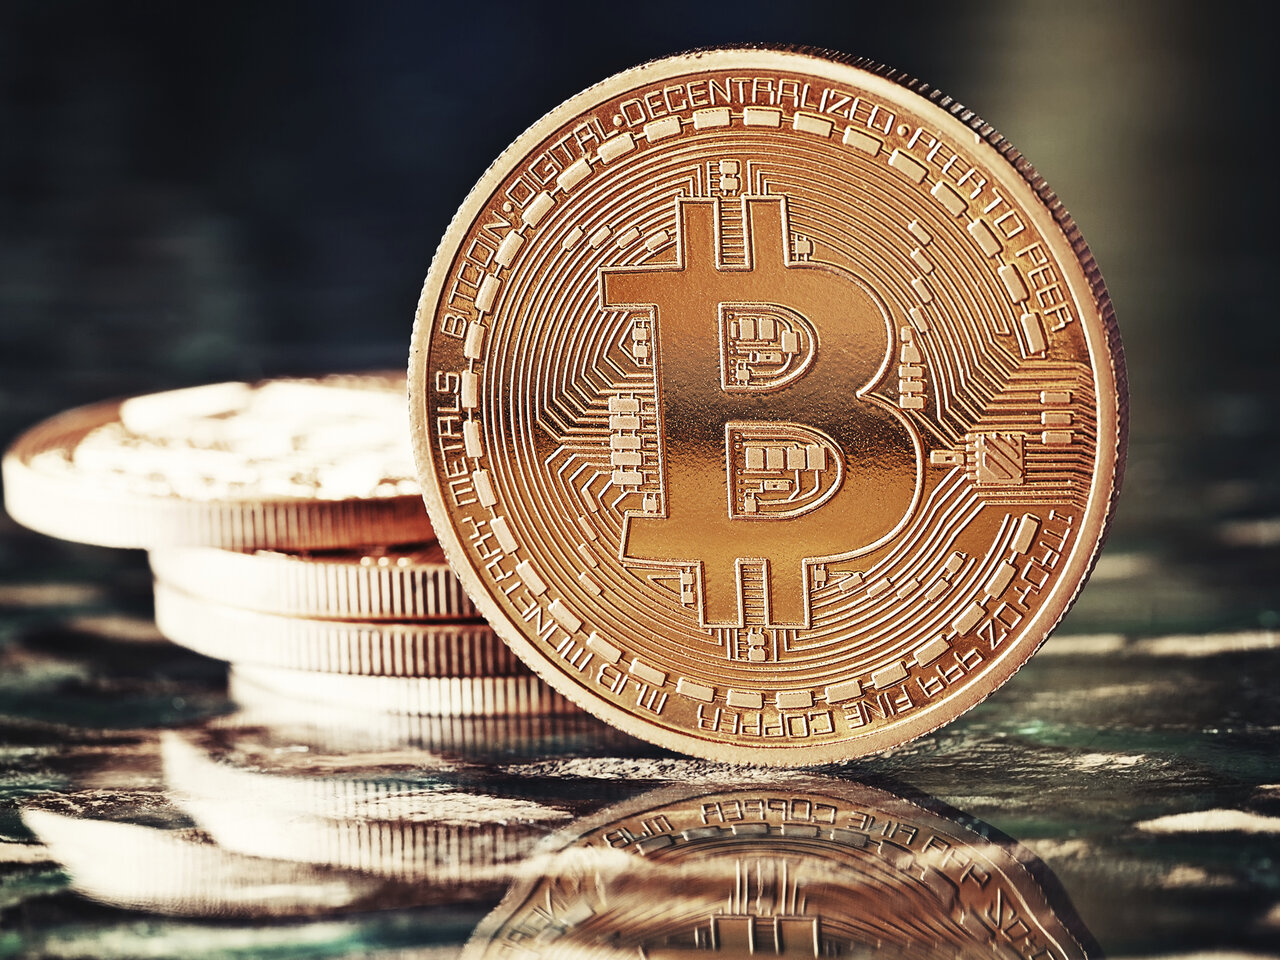 Bitcoin (BTC) price analysis: BitMEX long liquidation may be behind